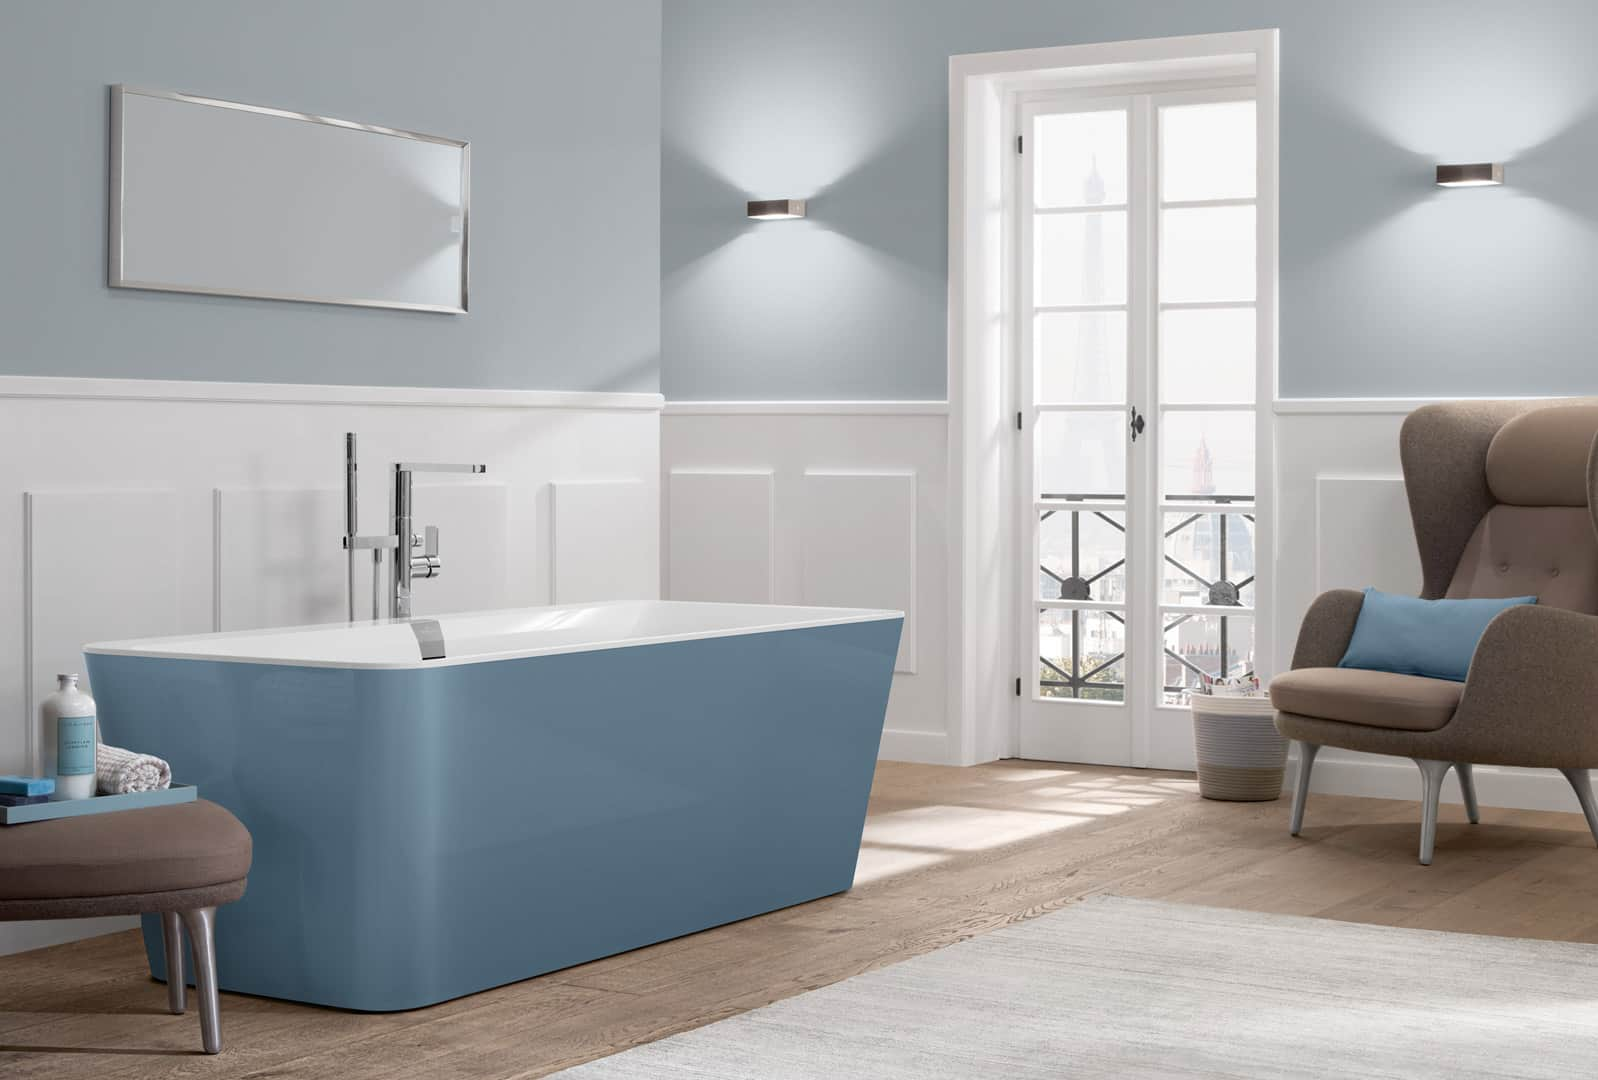 best farbe f r badezimmer contemporary. Black Bedroom Furniture Sets. Home Design Ideas